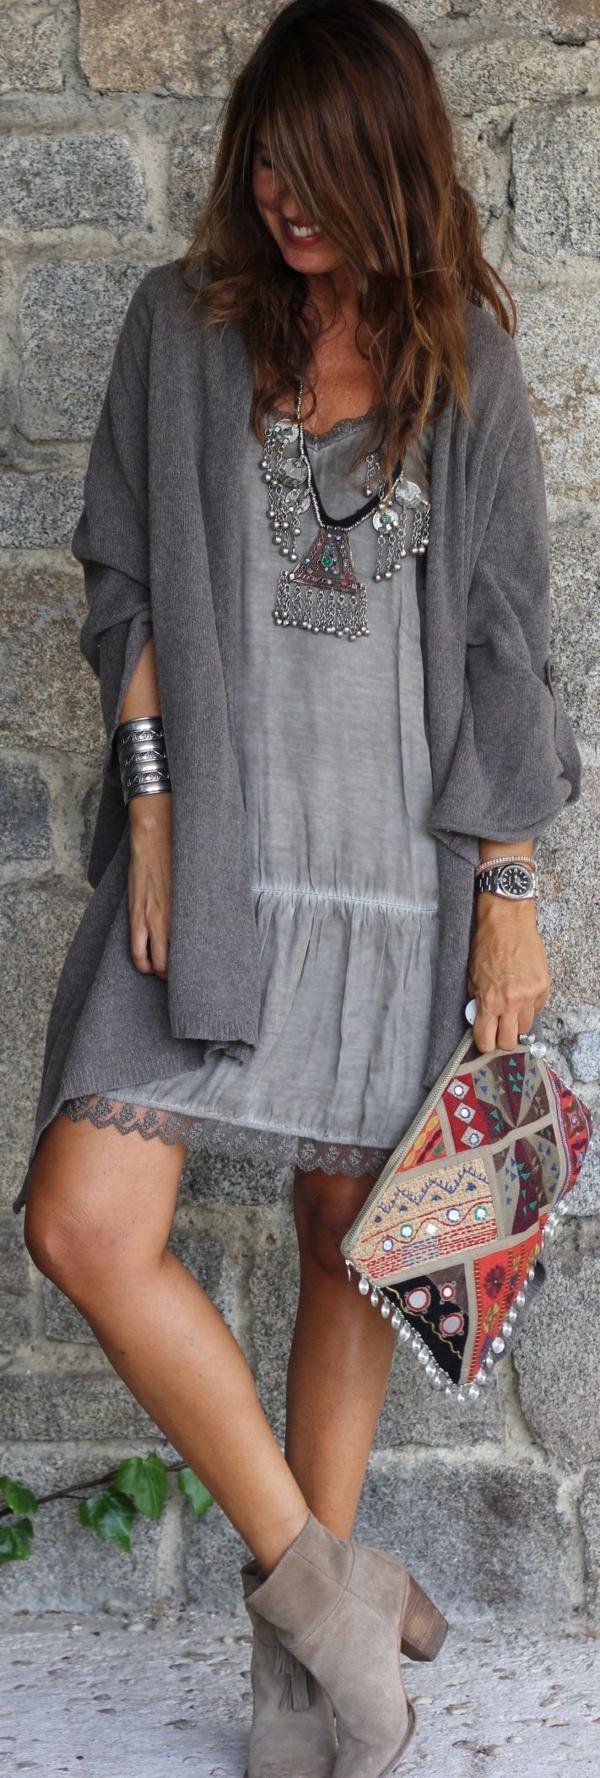 robe-hippie-chic-boho-style-en-gris